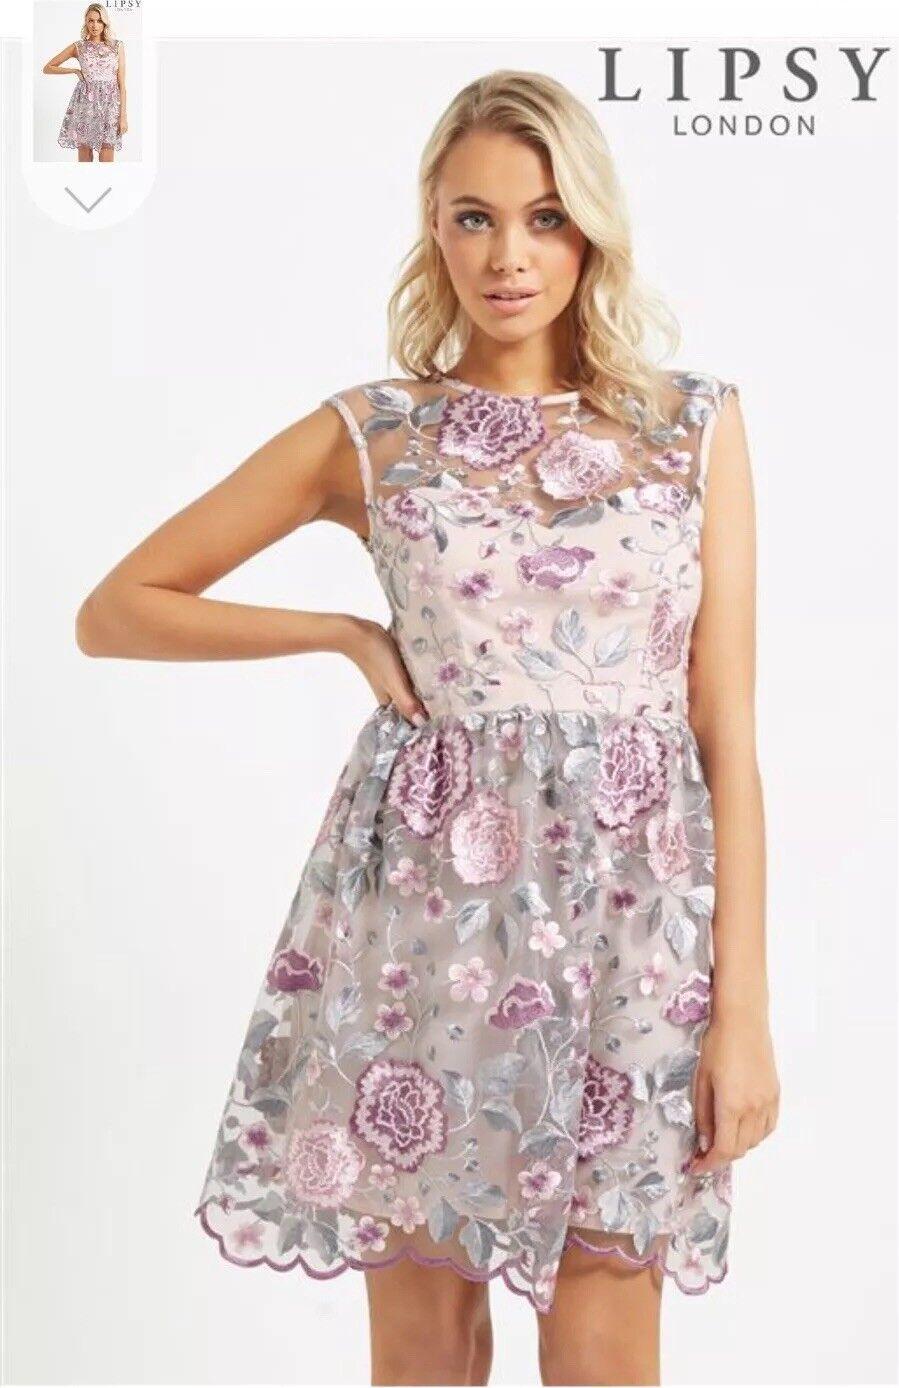 Bnwt New Women Lipsy Next Lace Flowers Wedding Party Evening Dress Size 8